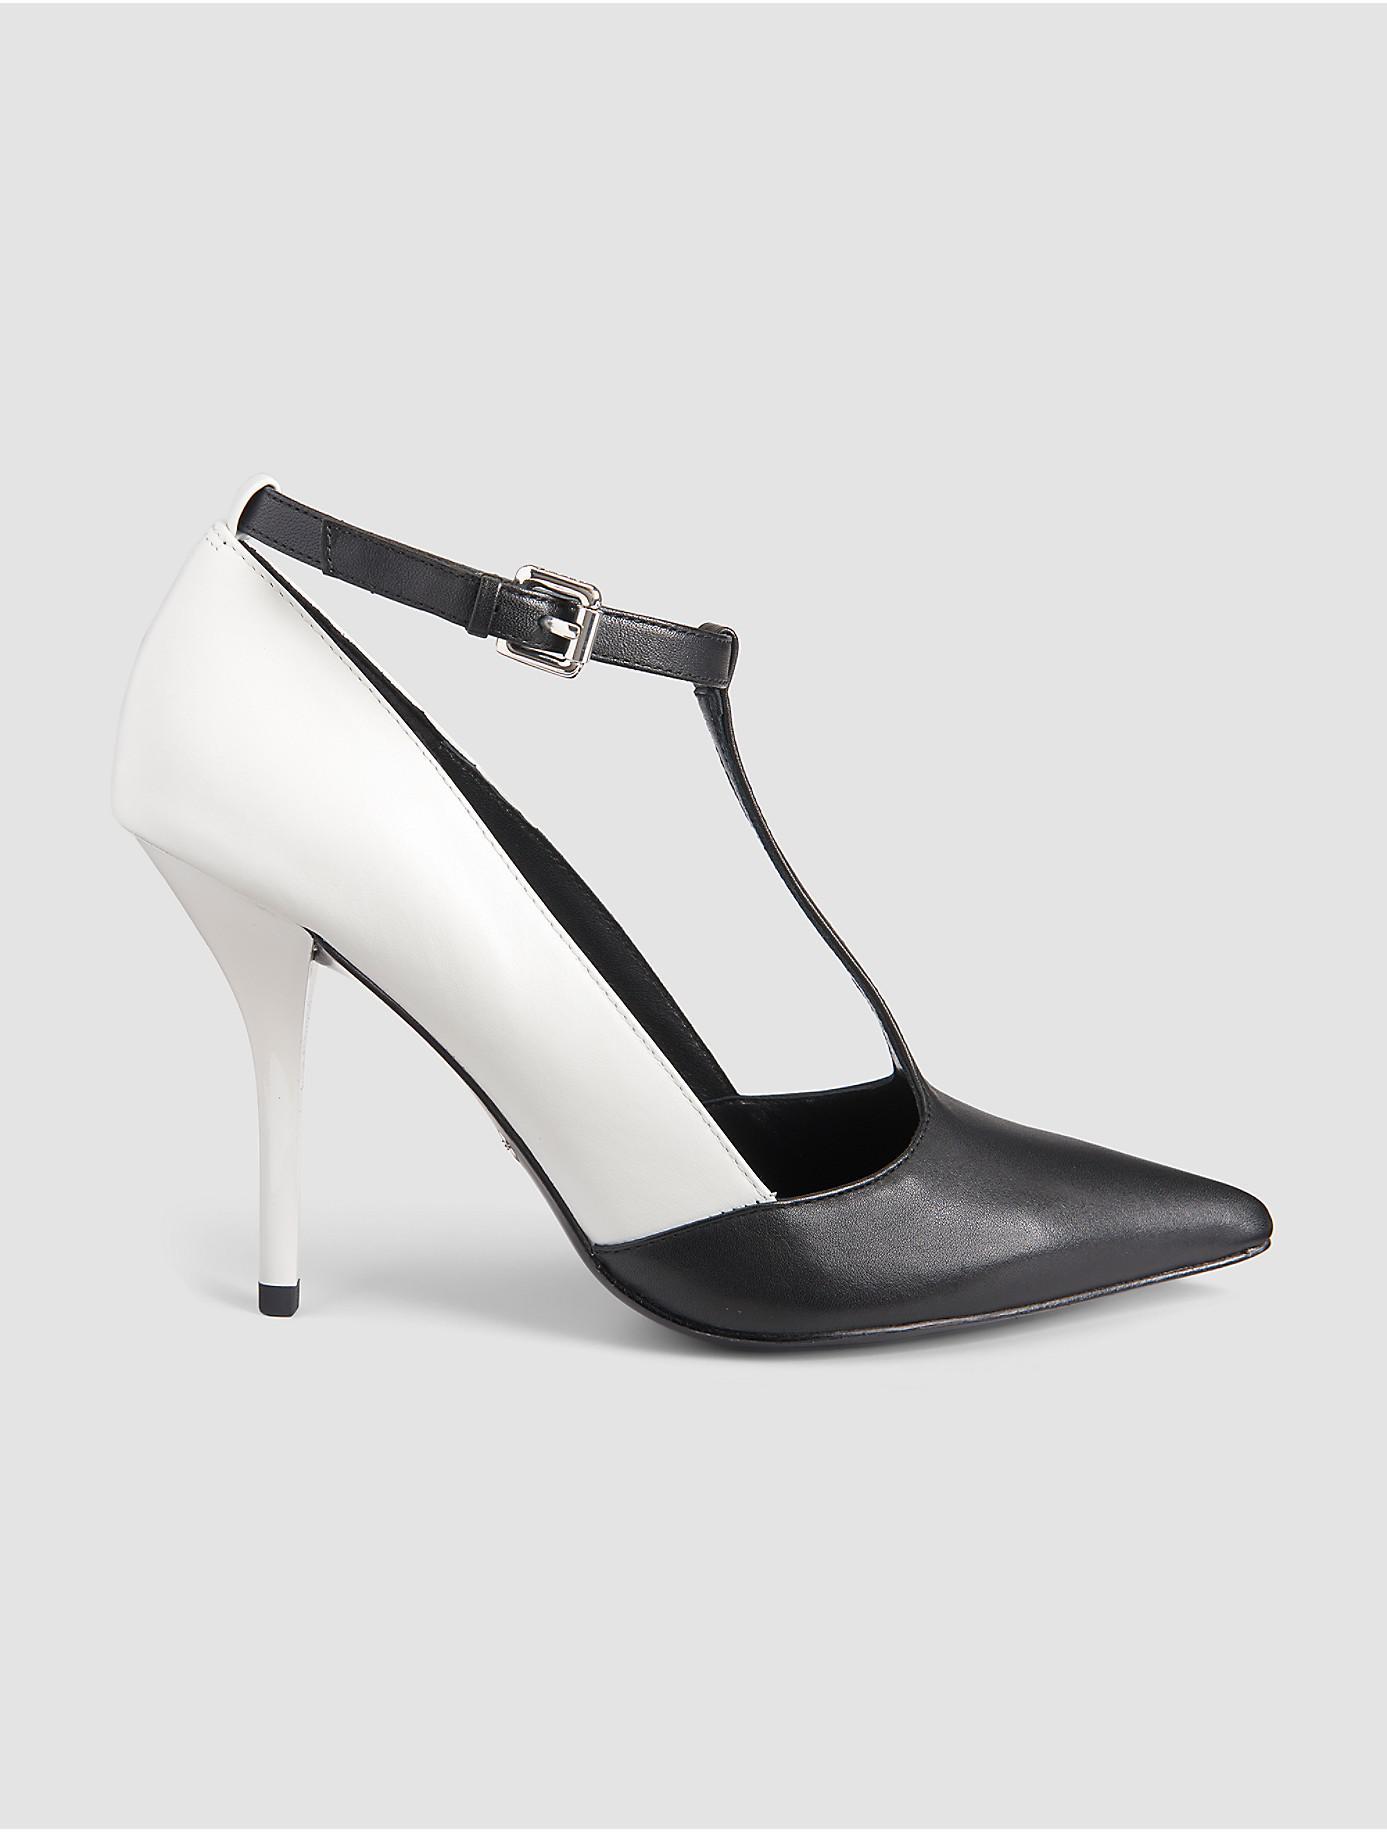 Calvin Klein 205W39NYC White Studded Heels LVsIGjYqa1